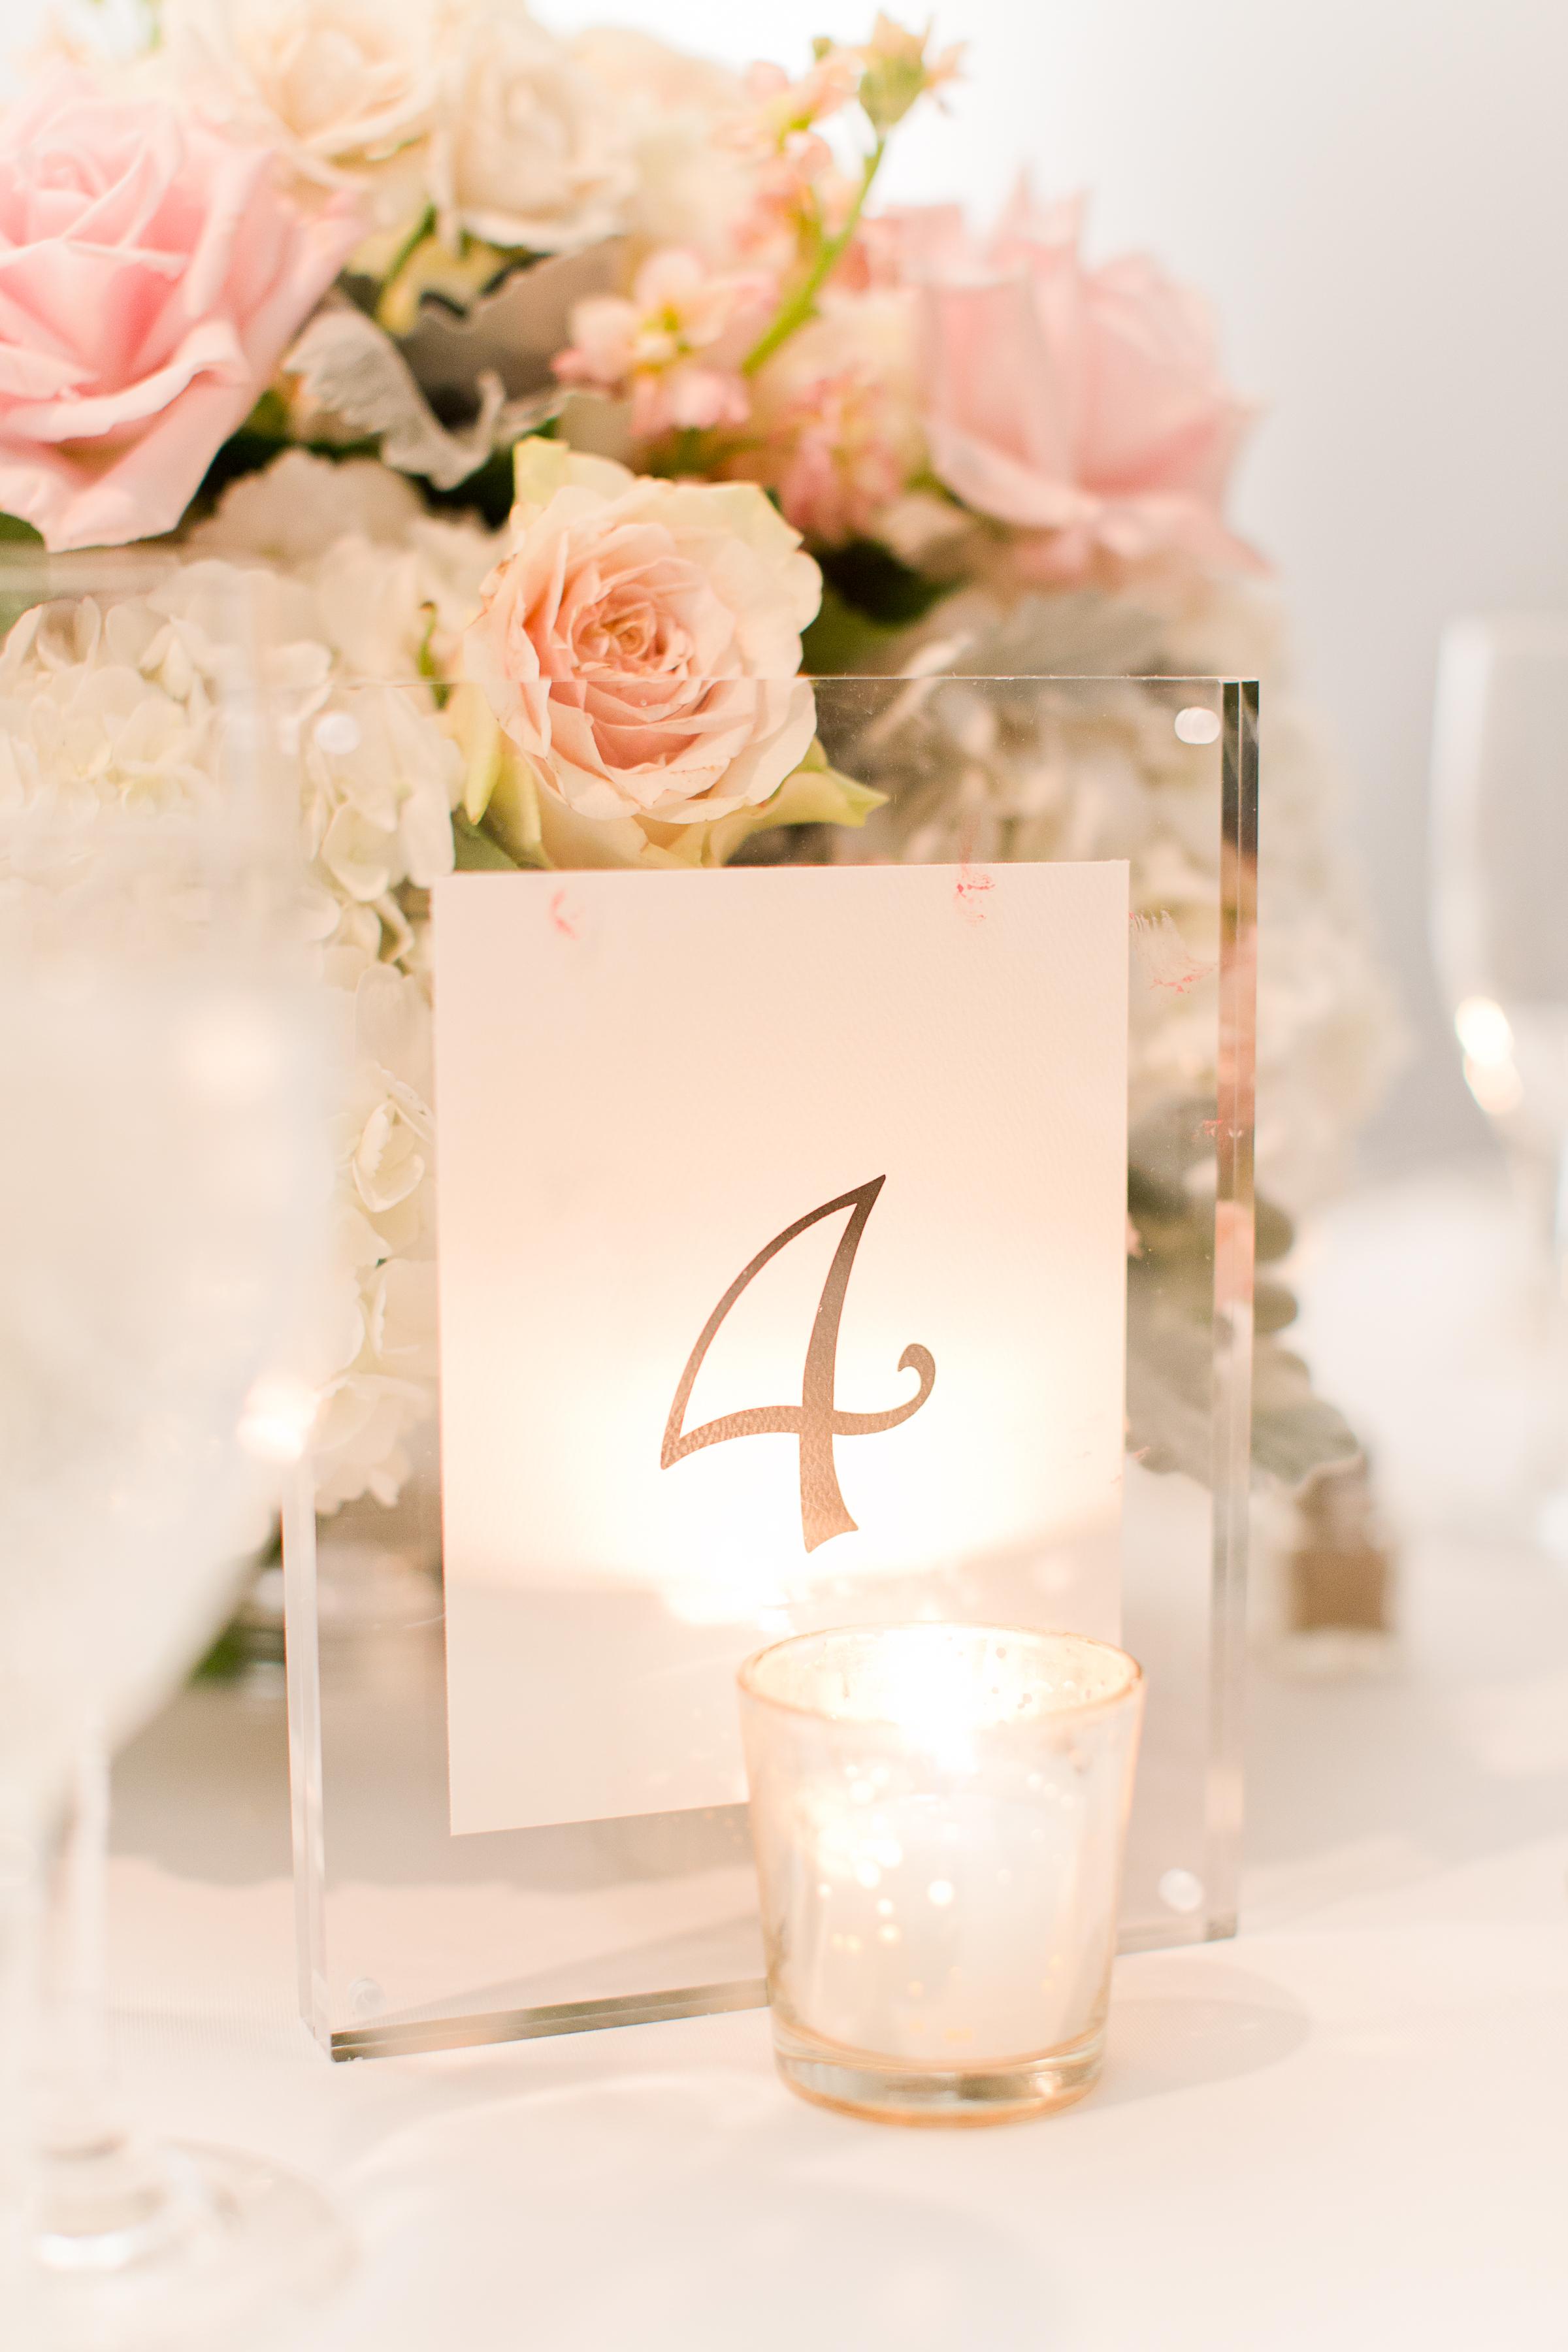 Melissa Kruse Photography - Genna + Anthony The Loading Dock Stamford CT Wedding-819.jpg